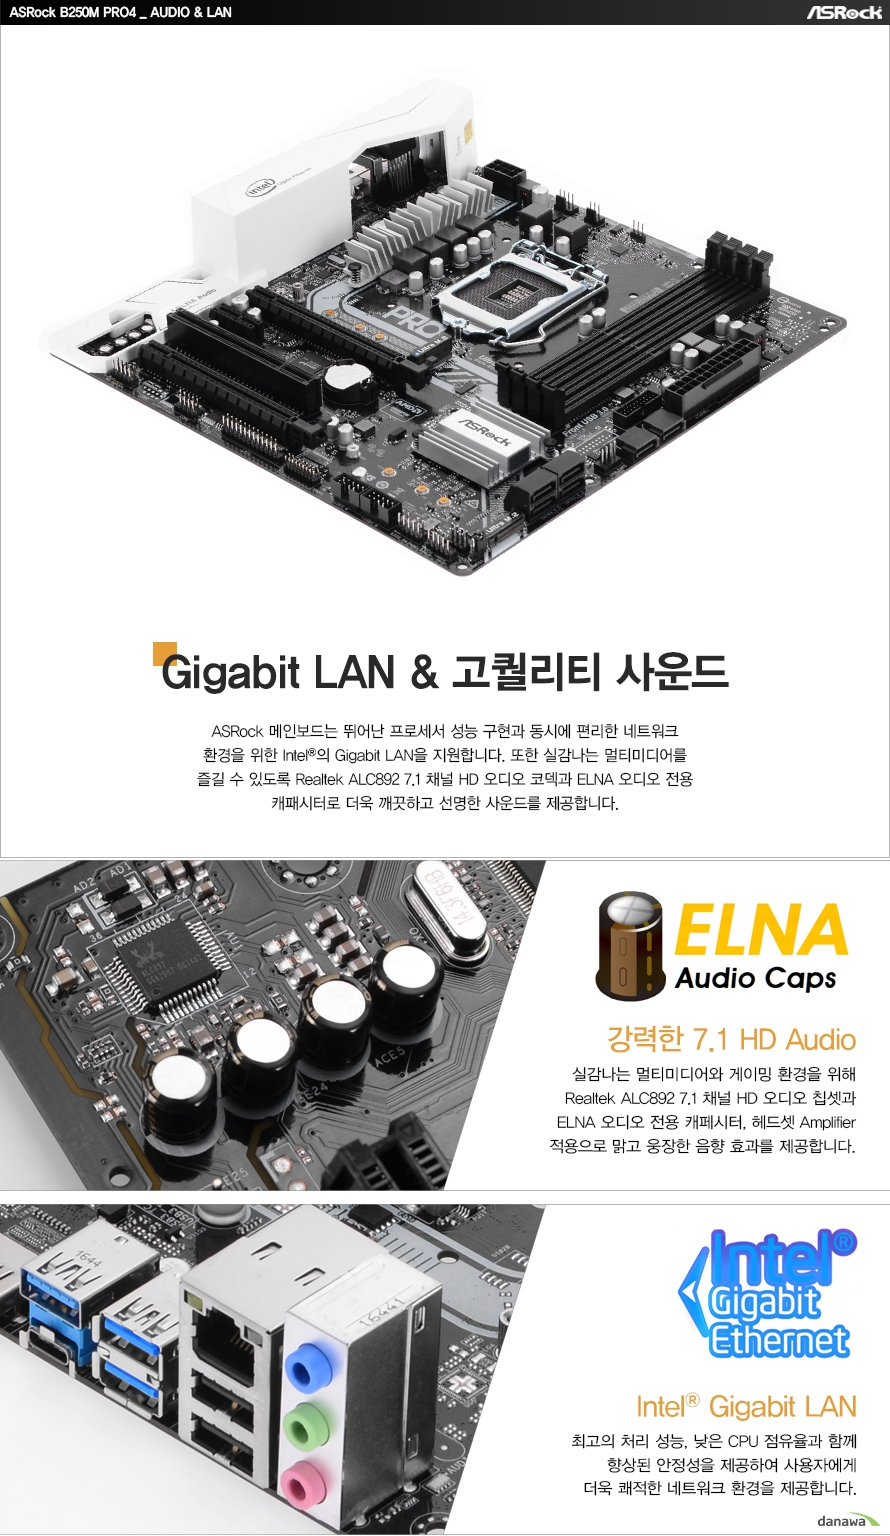 ASRock B250M PRO4 AUDIO, LANGigabit LAN, 고퀄리티 사운드ASRock 메인보드는 뛰어난 프로세서 성능 구현과 동시에 편리한 네트워크환경을 위한 Intel의 Gigabit LAN을 지원합니다. 또한 실감나는 멀티미디어를즐길 수 있도록 Realtek ALC892 7.1 채널 HD 오디오 코덱과 ELNA 오디오 전용캐패시터로 더욱 깨끗하고 선명한 사운드를 제공합니다.ELNA Audio Caps 강력한 7.1 HD Audio실감나는 멀티미디어와 게이밍 환경을 위해 Realtek ALC892 7.1 채널 HD 오디오 칩셋과 ELNA 오디오 전용 캐페시터, 헤드셋 Amplitier 적용으로 맑고 웅장한 음향 효과를 제공합니다.Intel Gigabit LAN최고의 처리 성능, 낮은 CPU 점유율과 함께 향상된 안정성을 제공하여 사용자에게 더욱 쾌적한 네트워크 환경을 제공합니다.